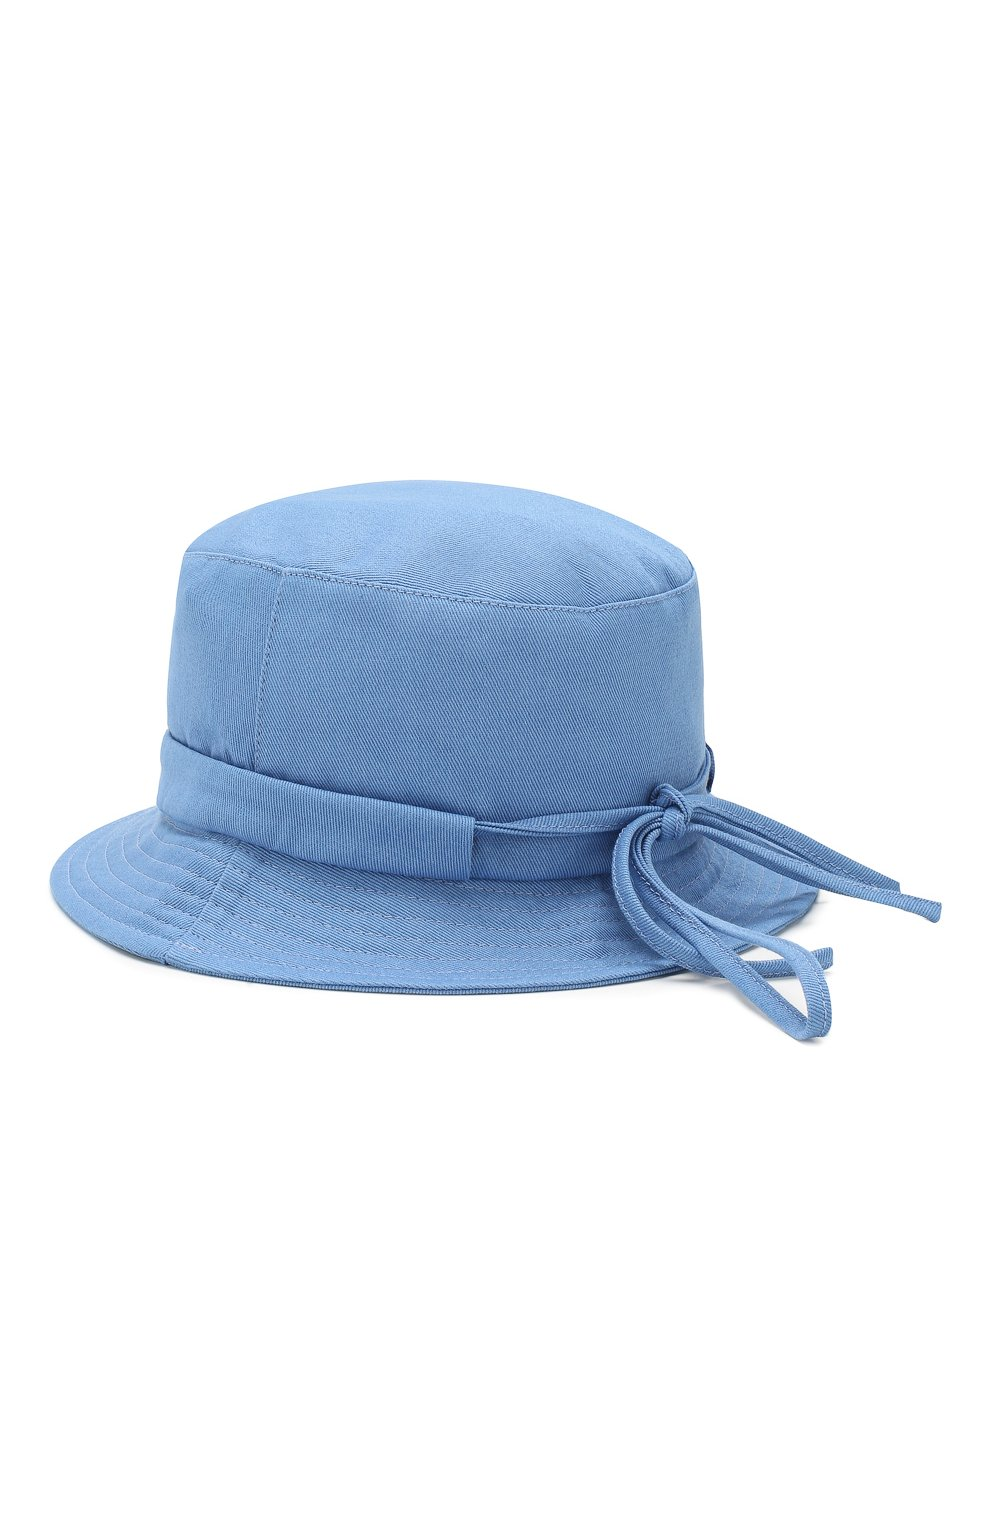 Мужская панама le bob gadjo JACQUEMUS голубого цвета, арт. 205AC03/69320 | Фото 2